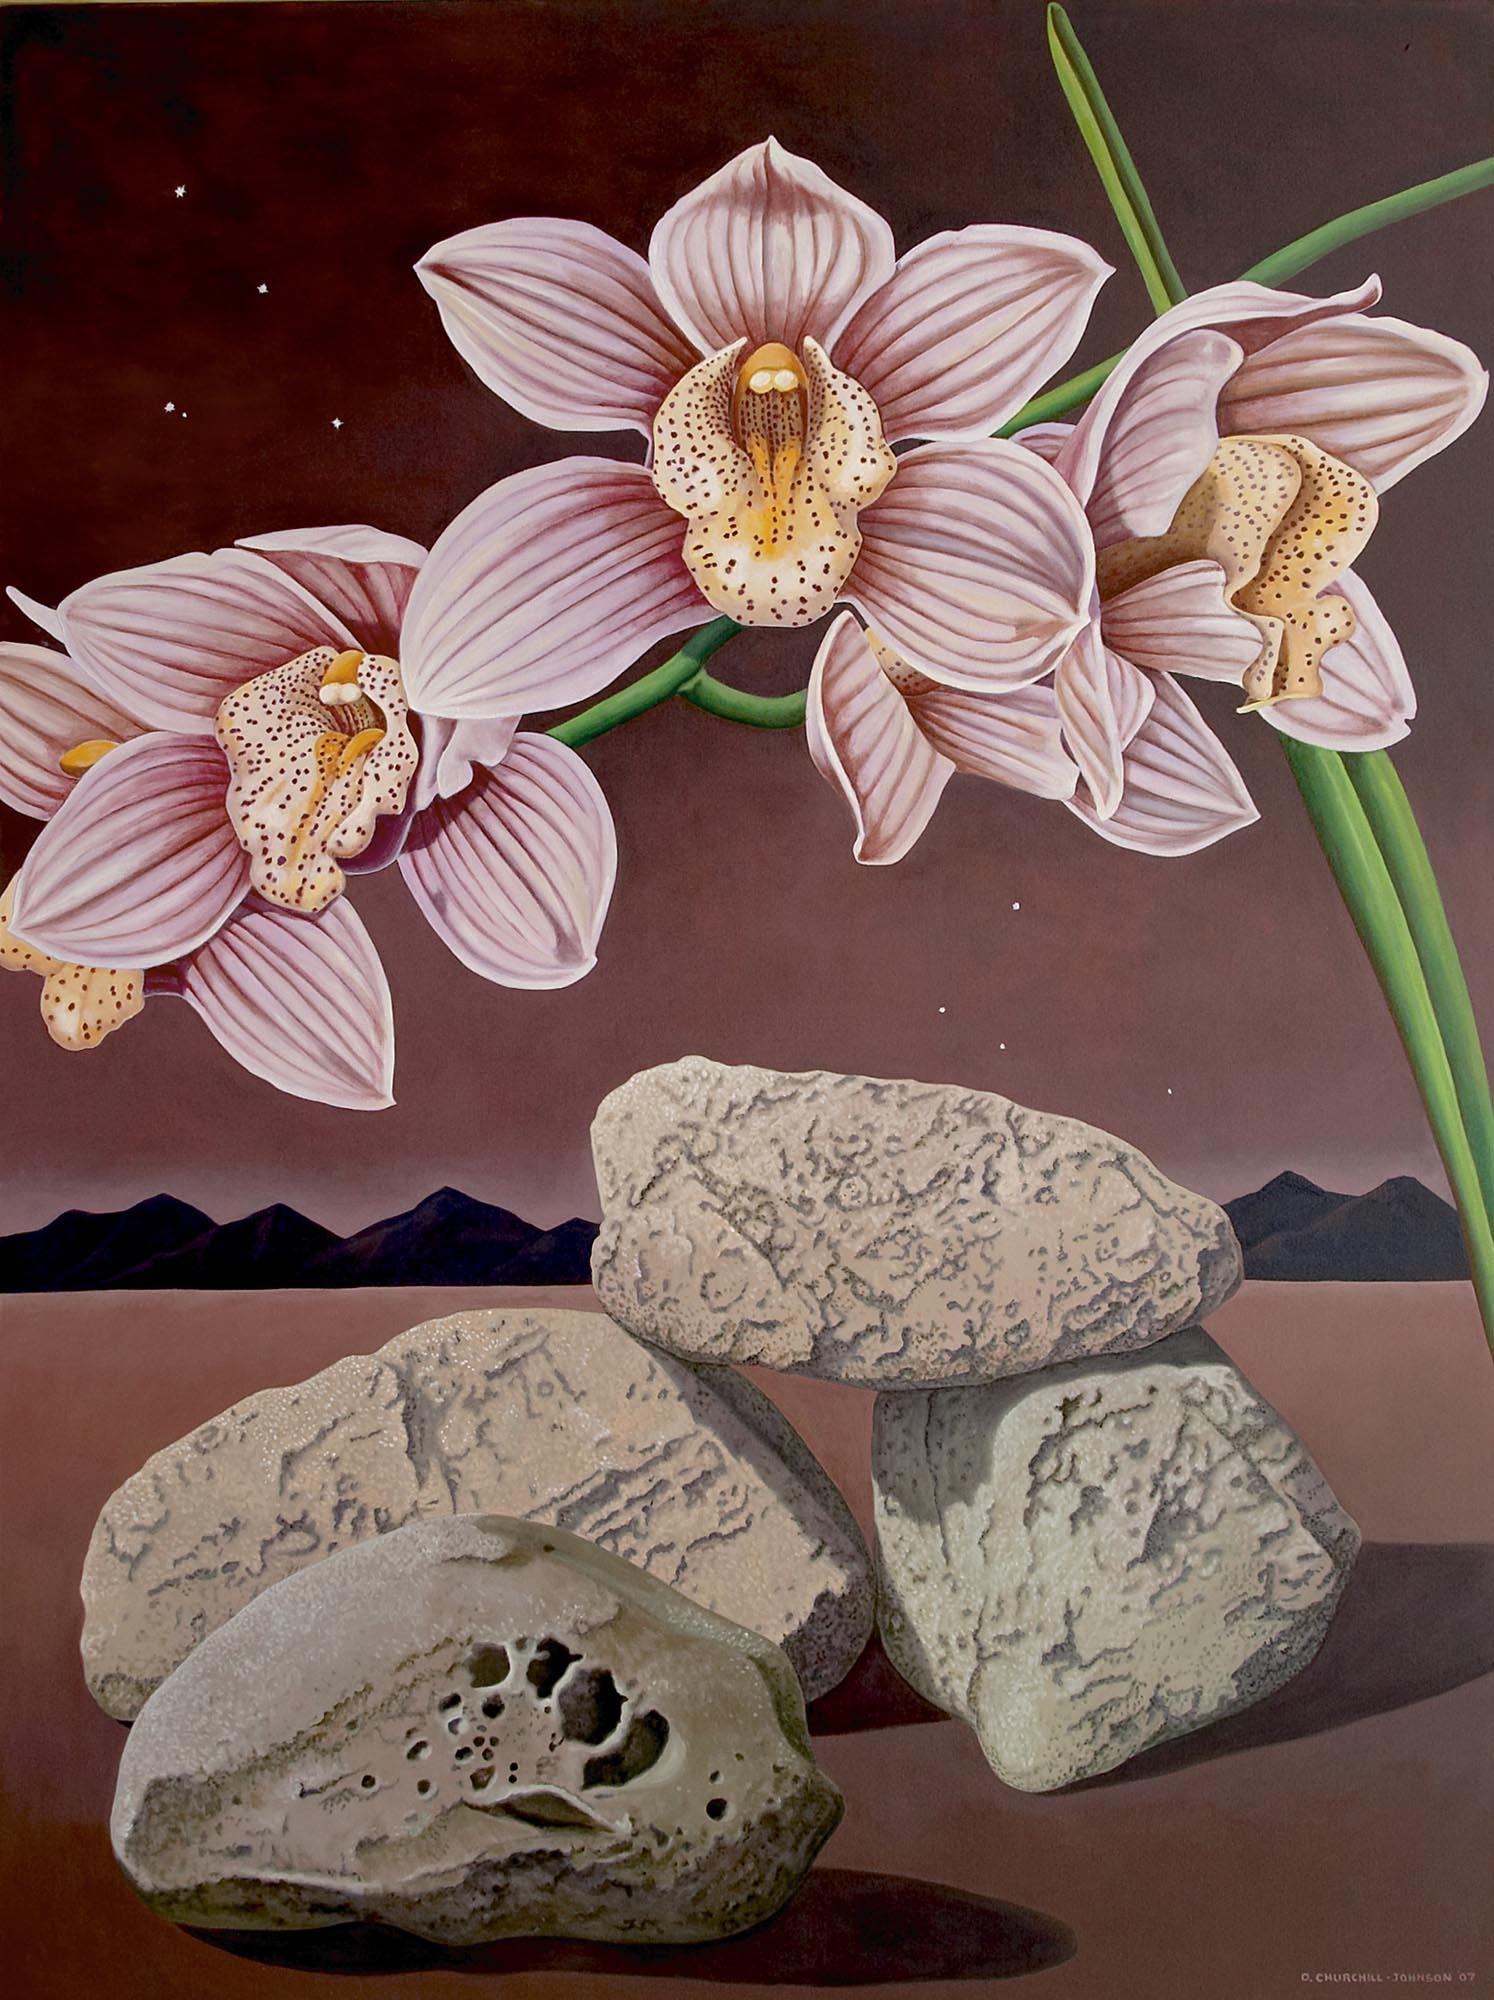 Rocks & Cymbidium, 72 x 54 inches